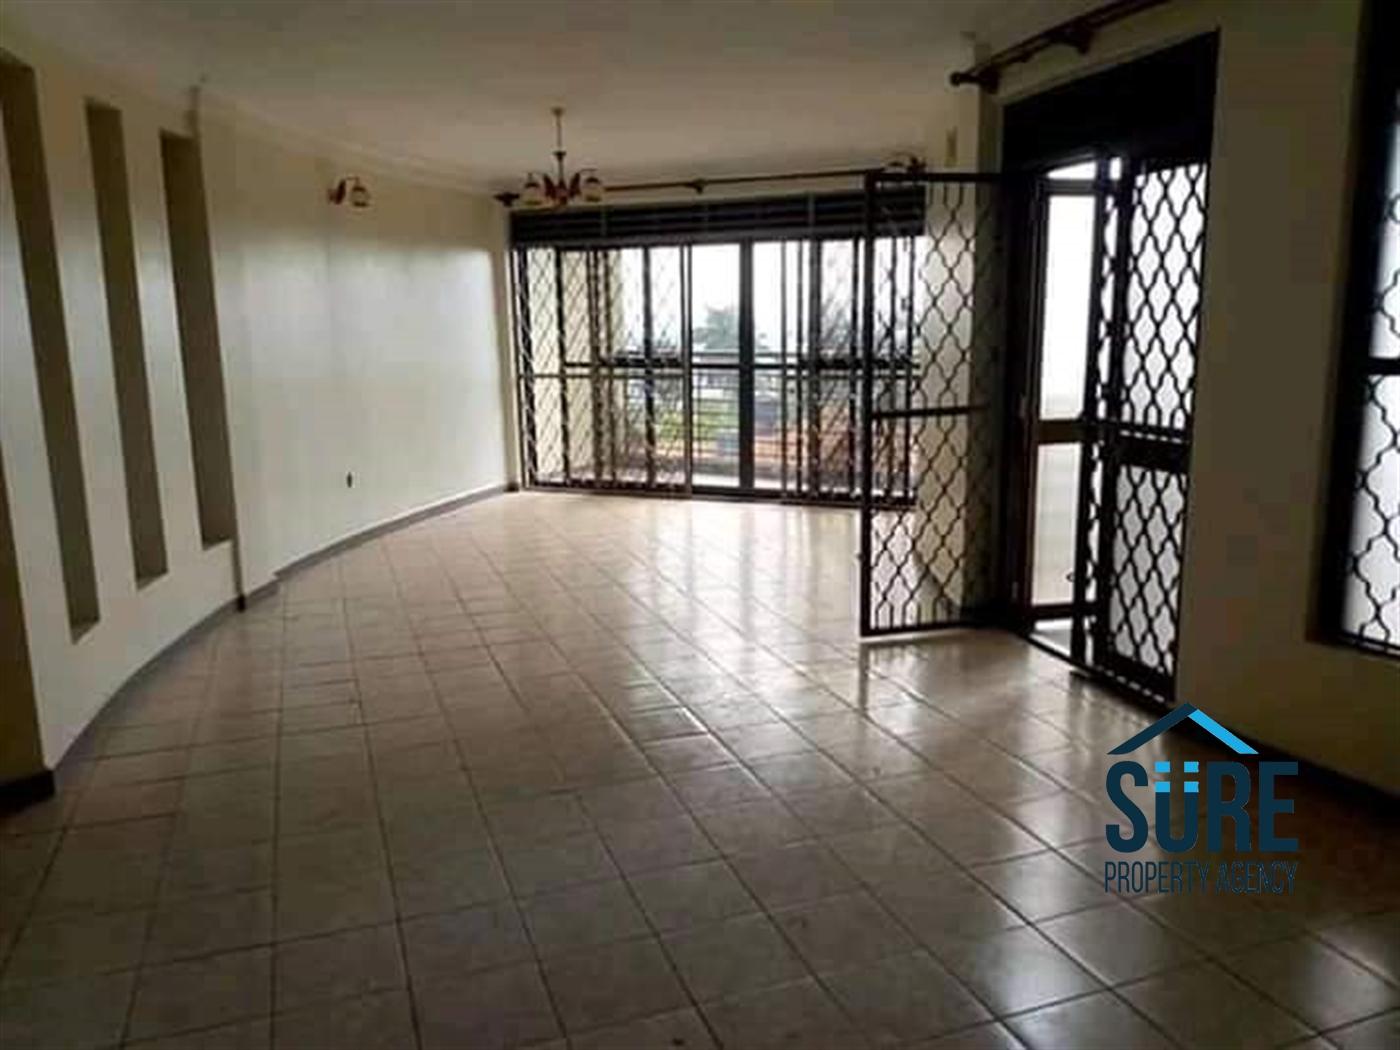 Apartment for rent in Kisugu Kampala